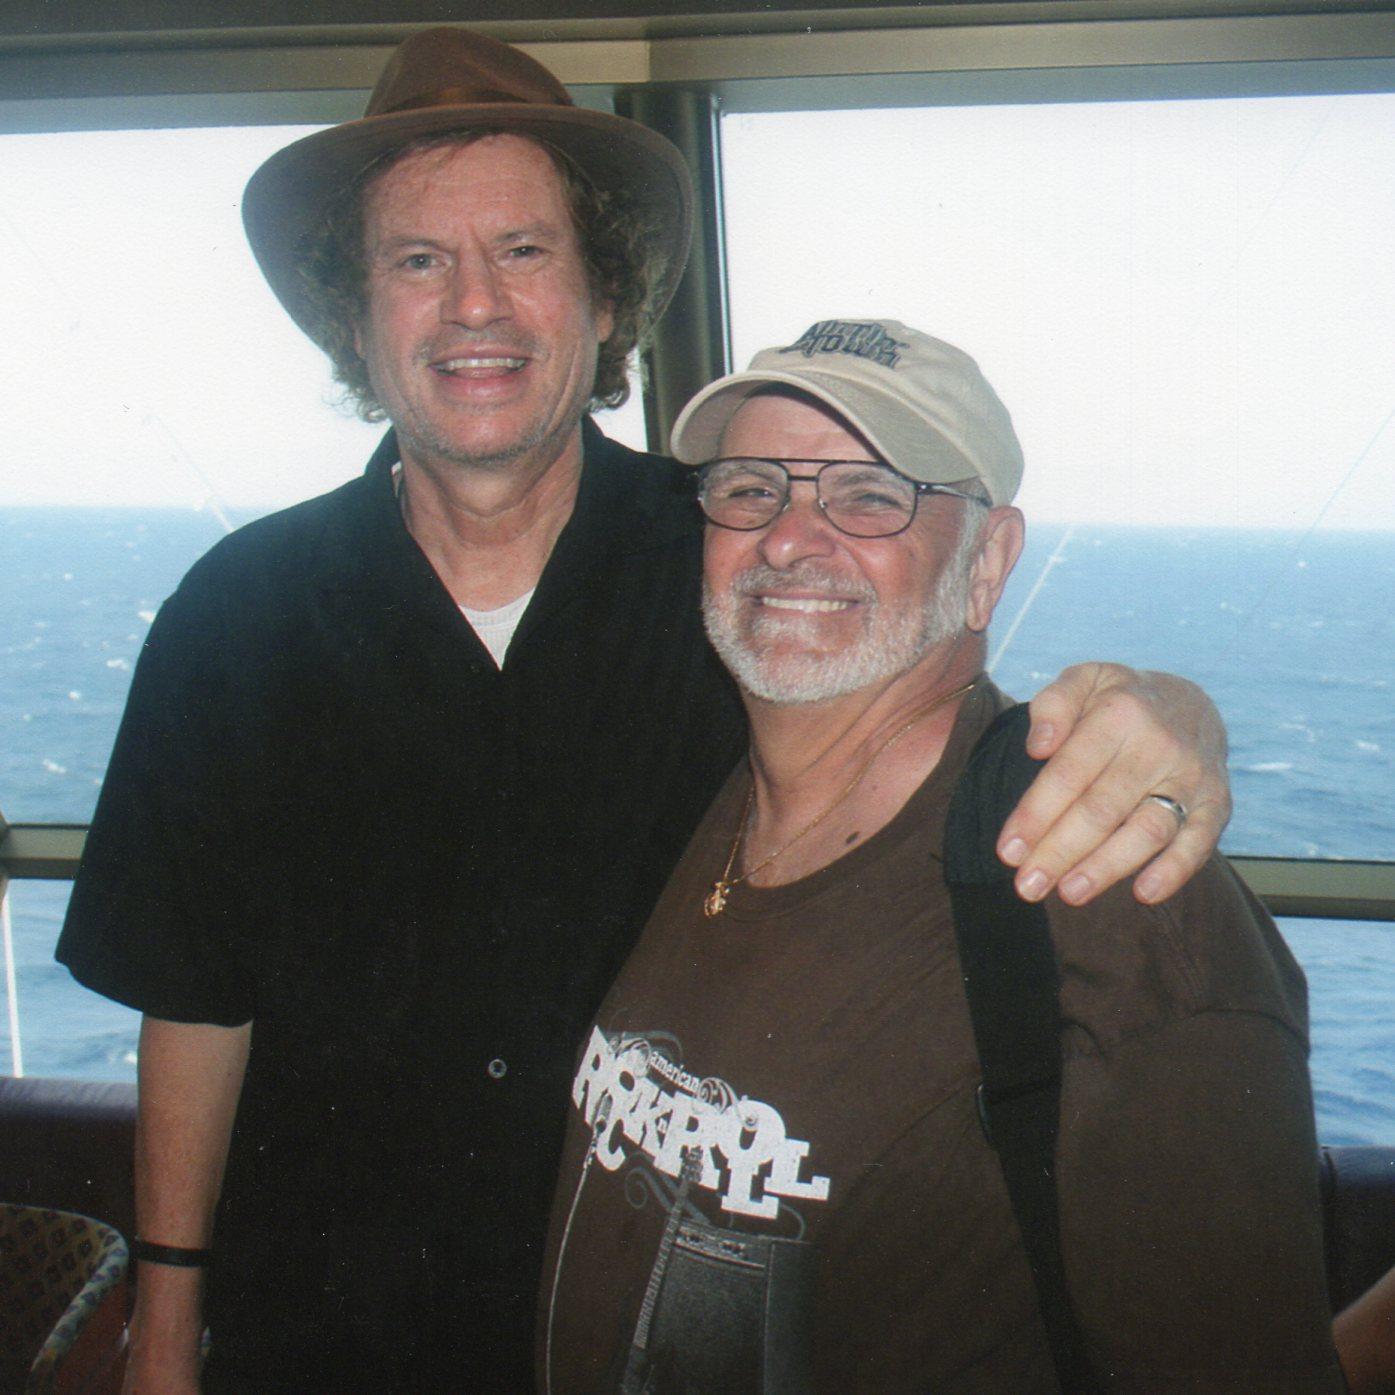 Jimmy Hall (Wet Willie) & (Hank Williams Jr.)